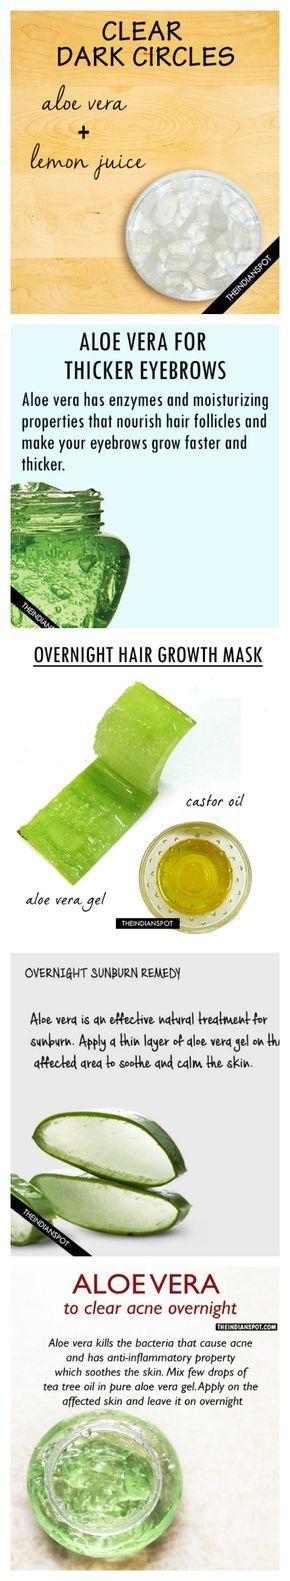 Aloe vera and lemon juice for dark circles